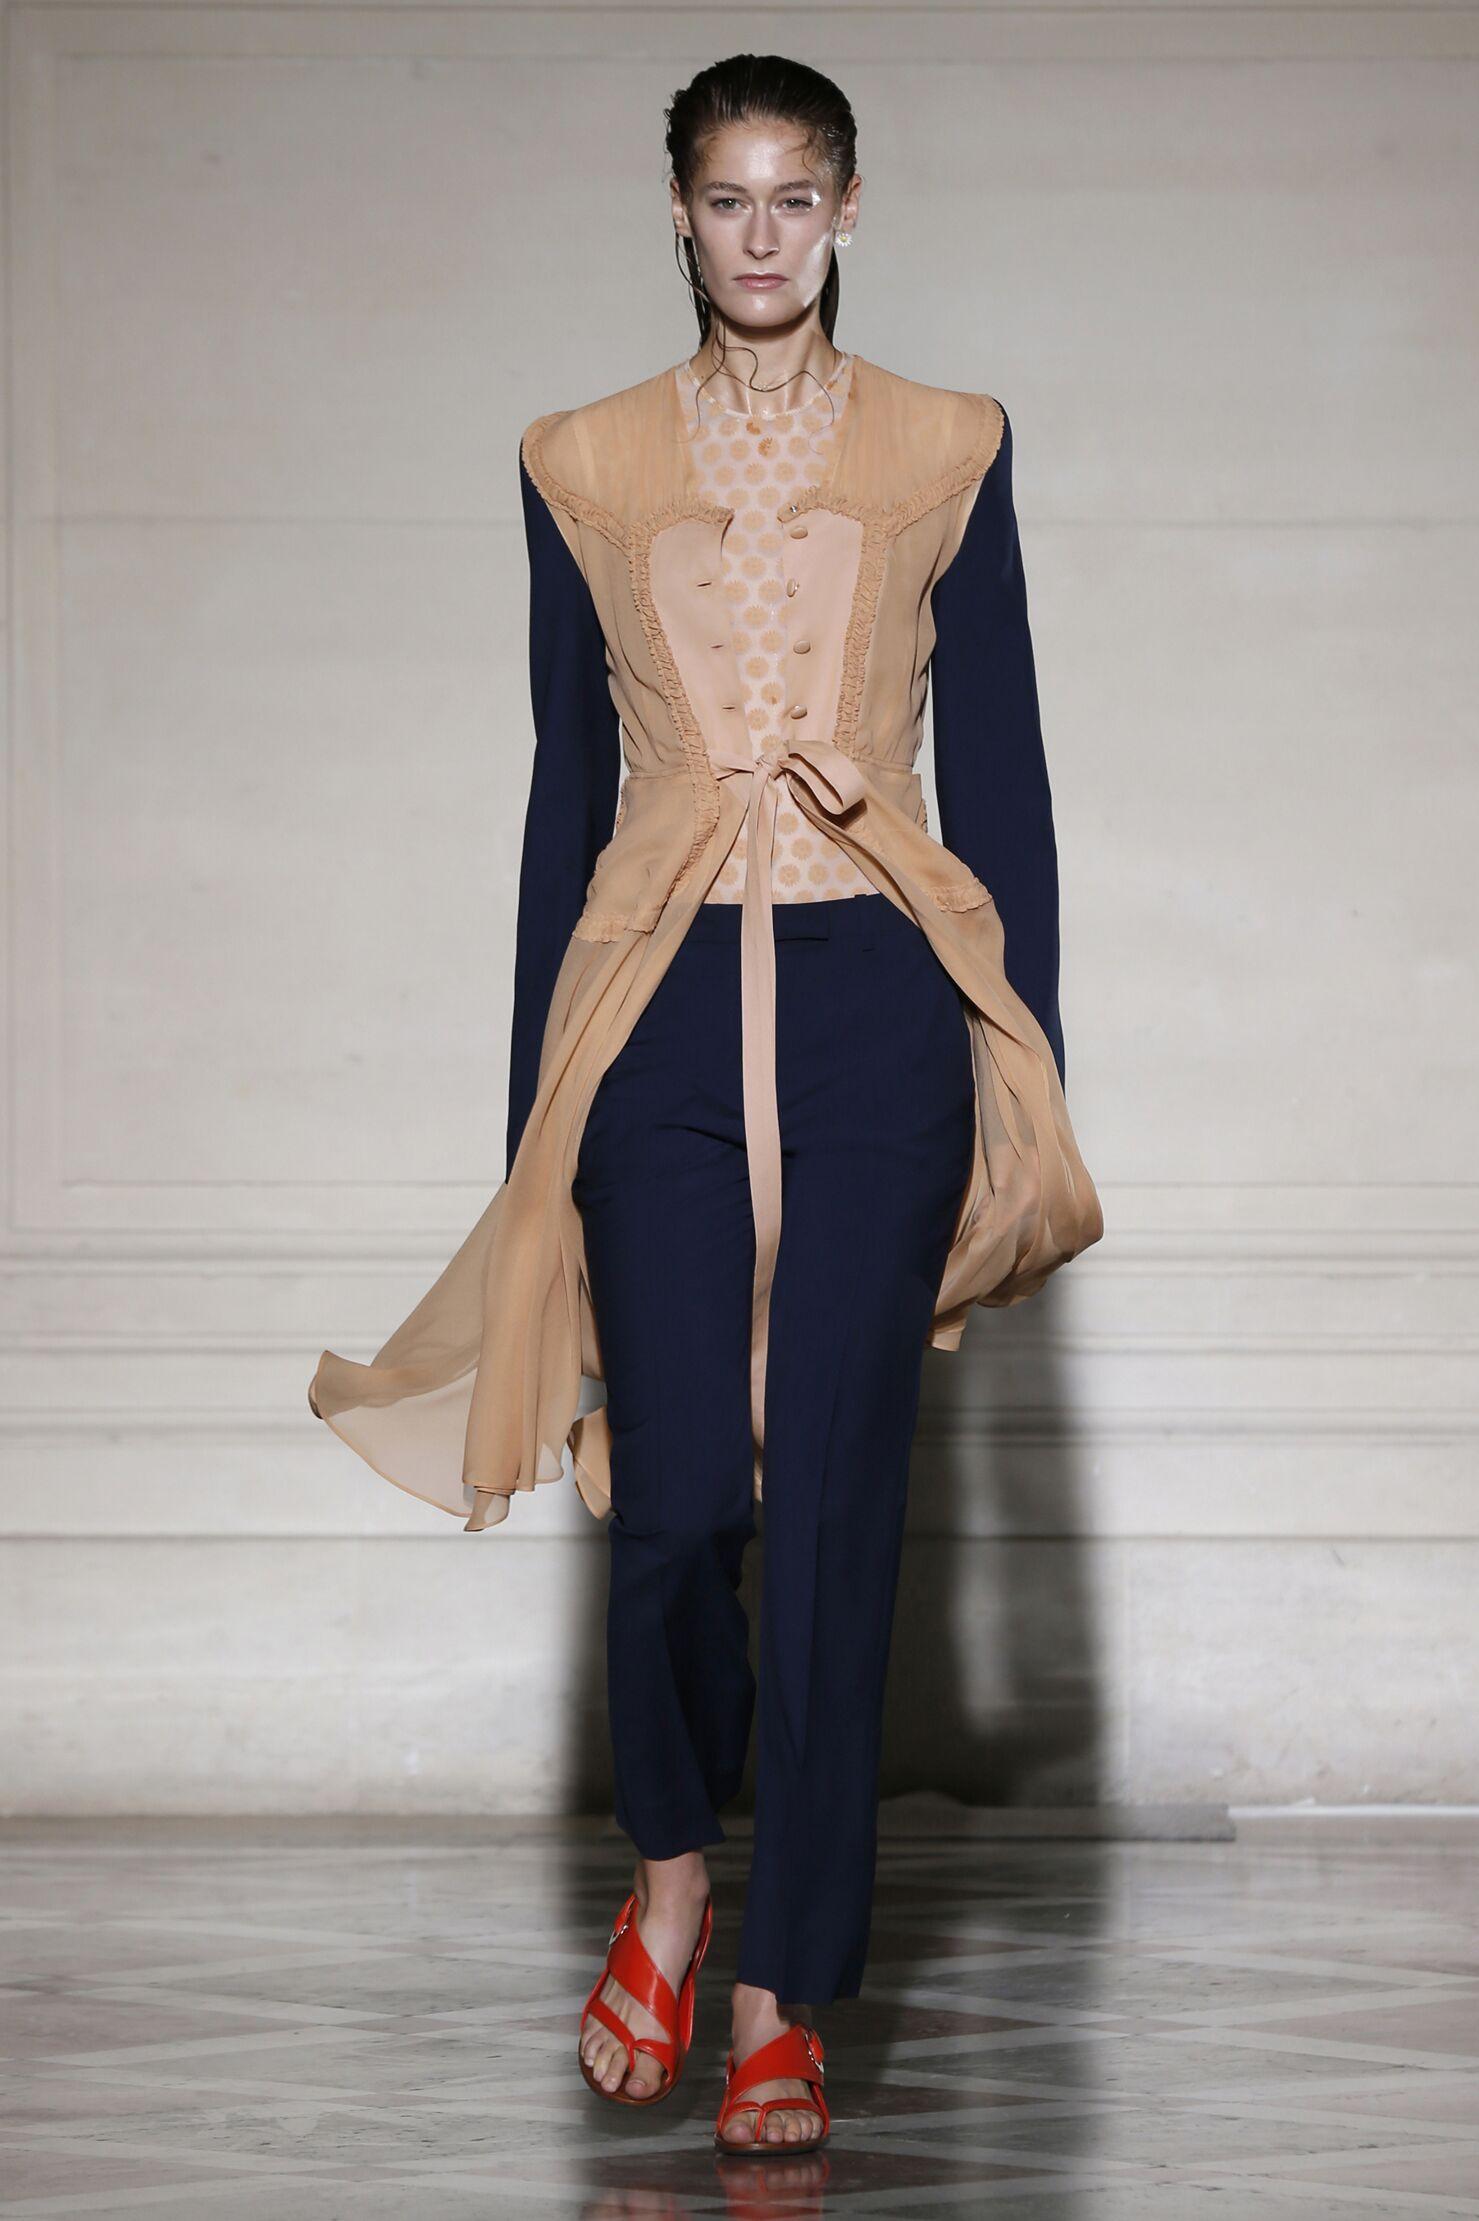 Maison Martin Margiela Woman Paris Fashion Week